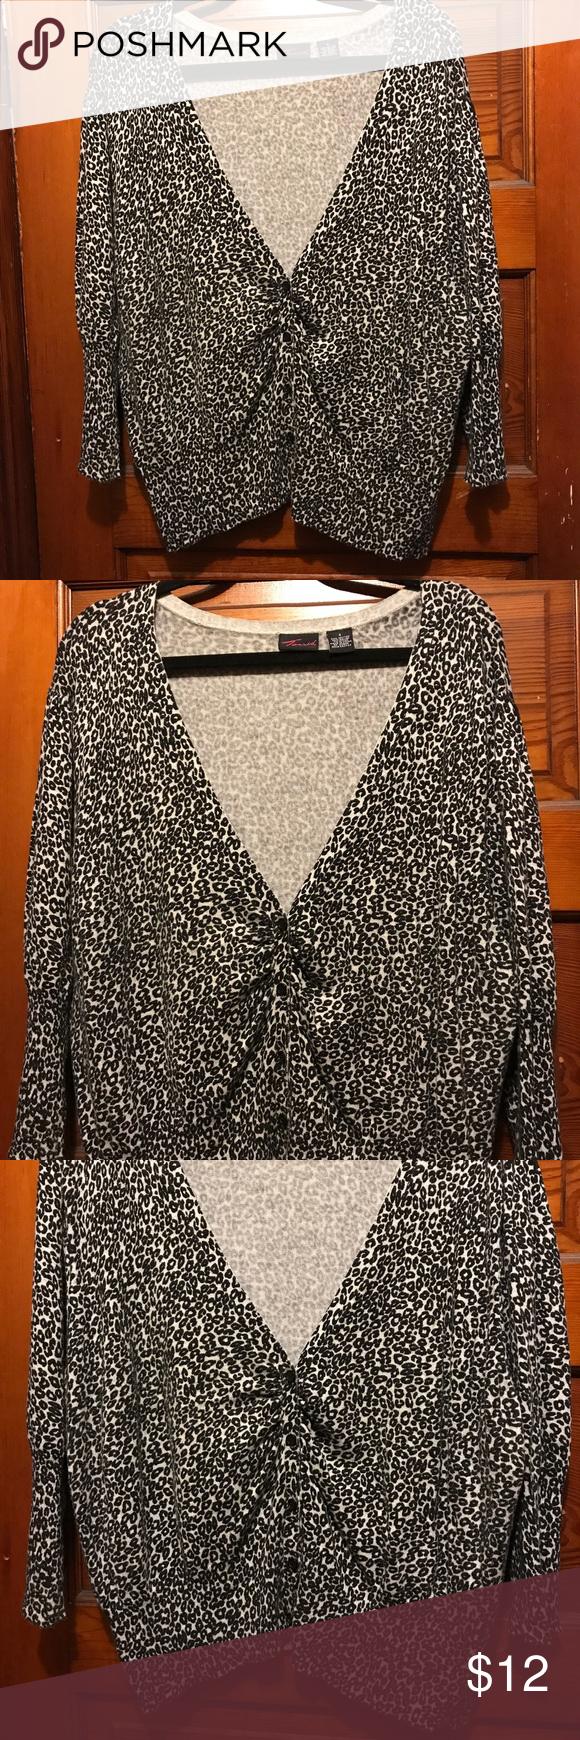 Torrid Black & White Leopard print cardigan